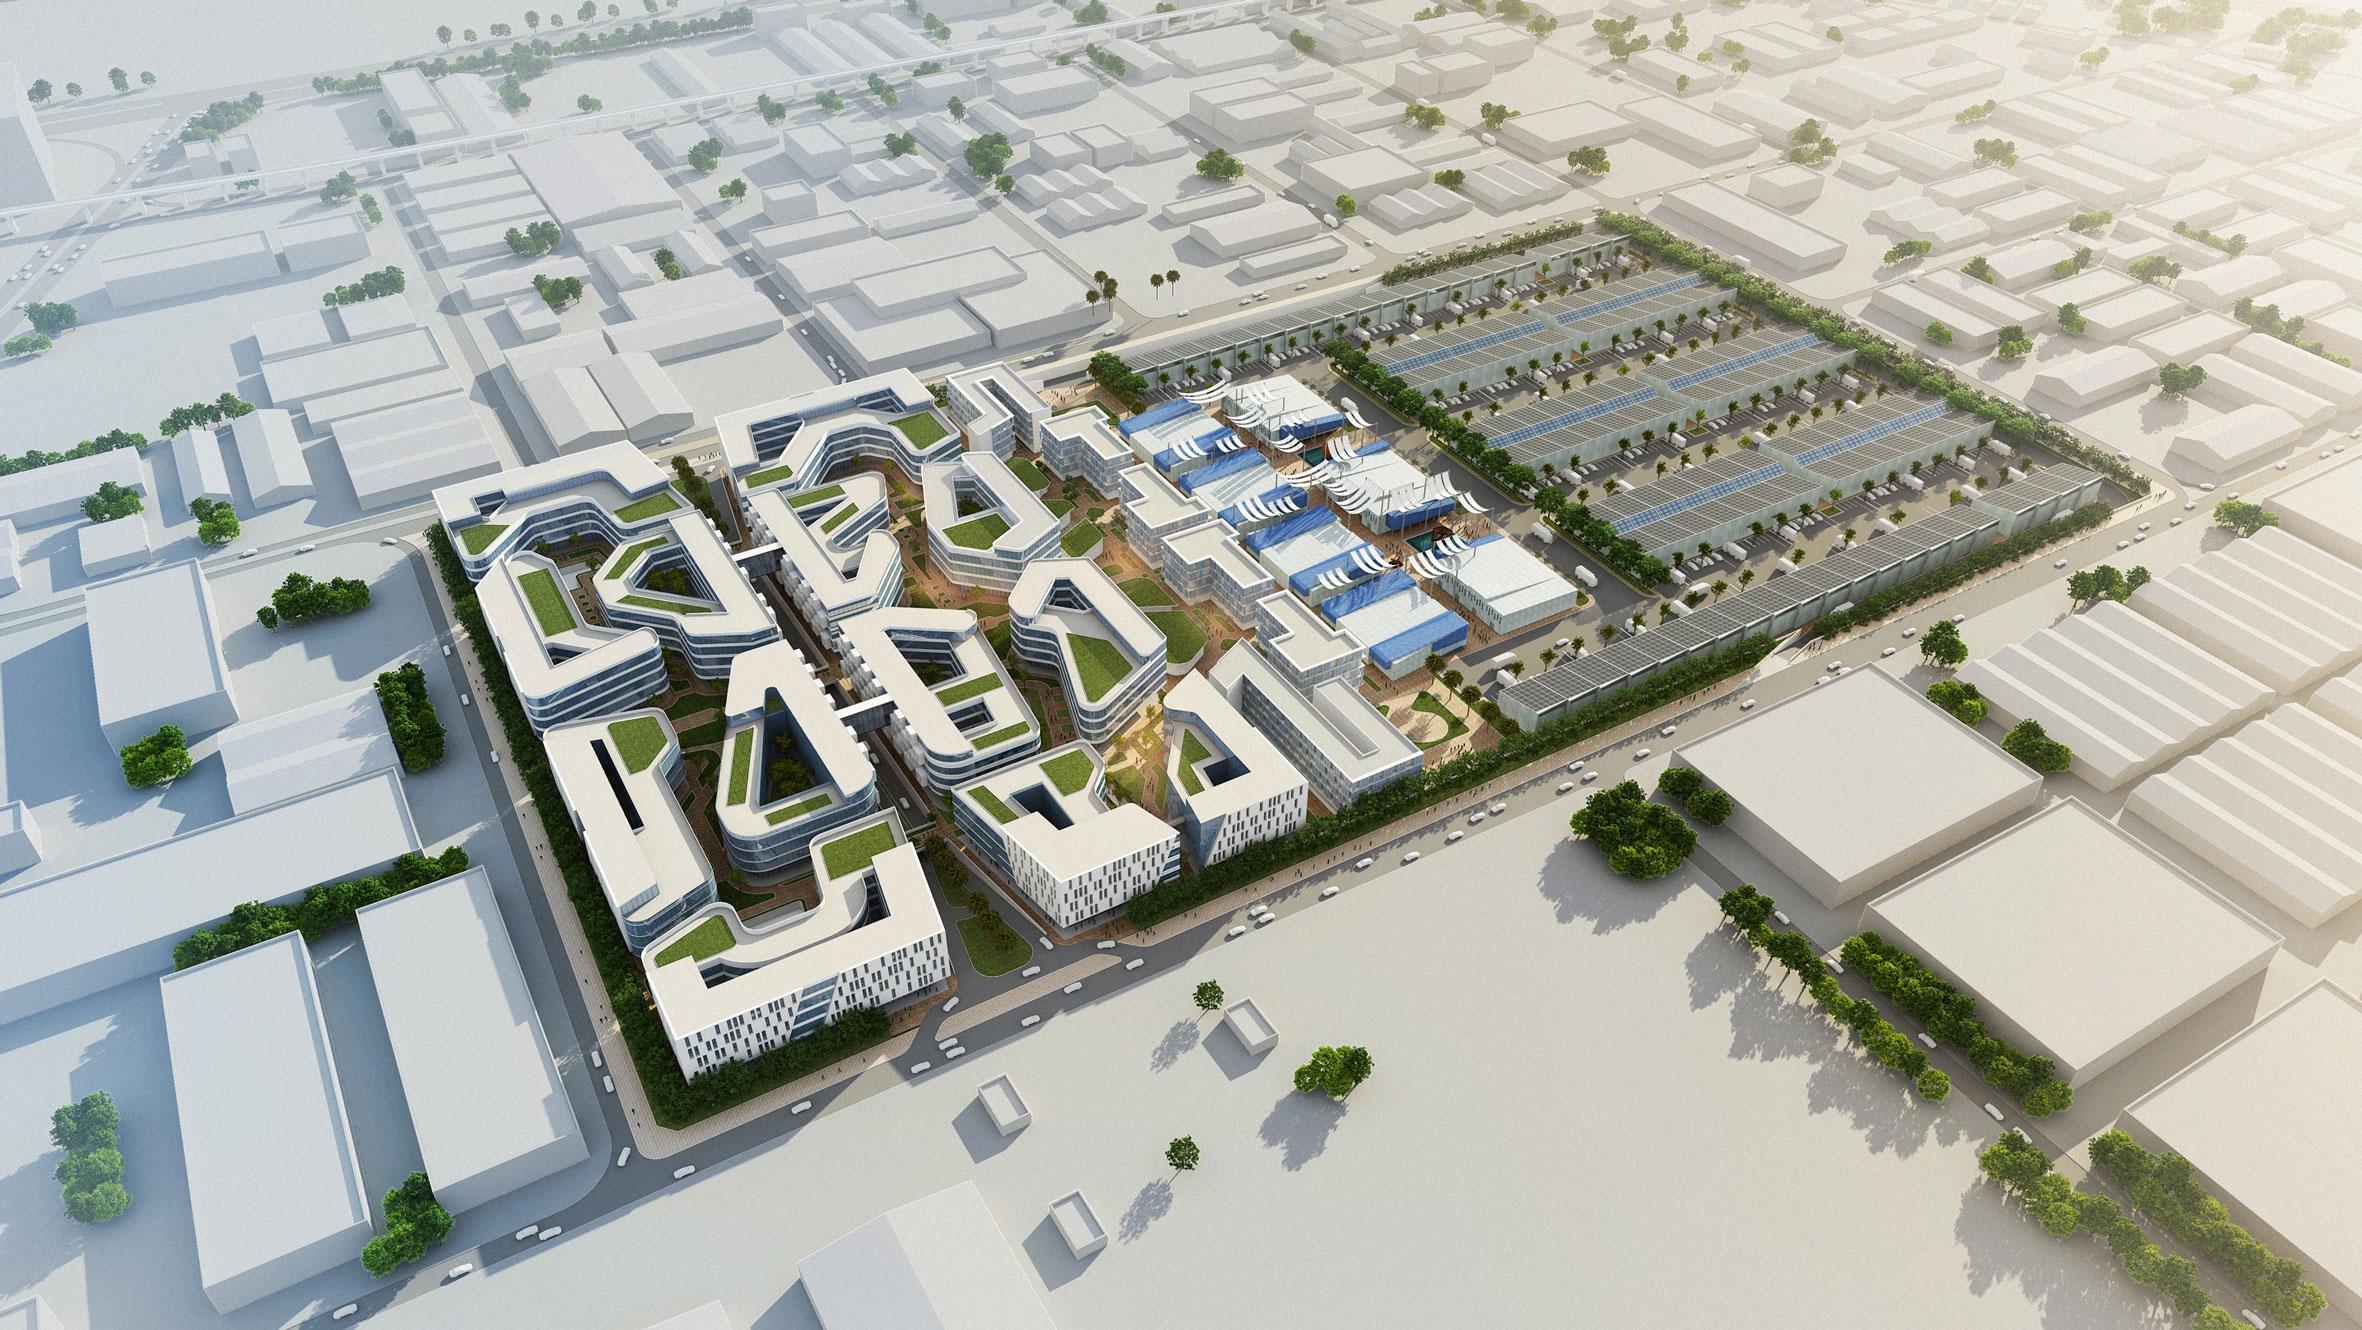 迪拜规划图